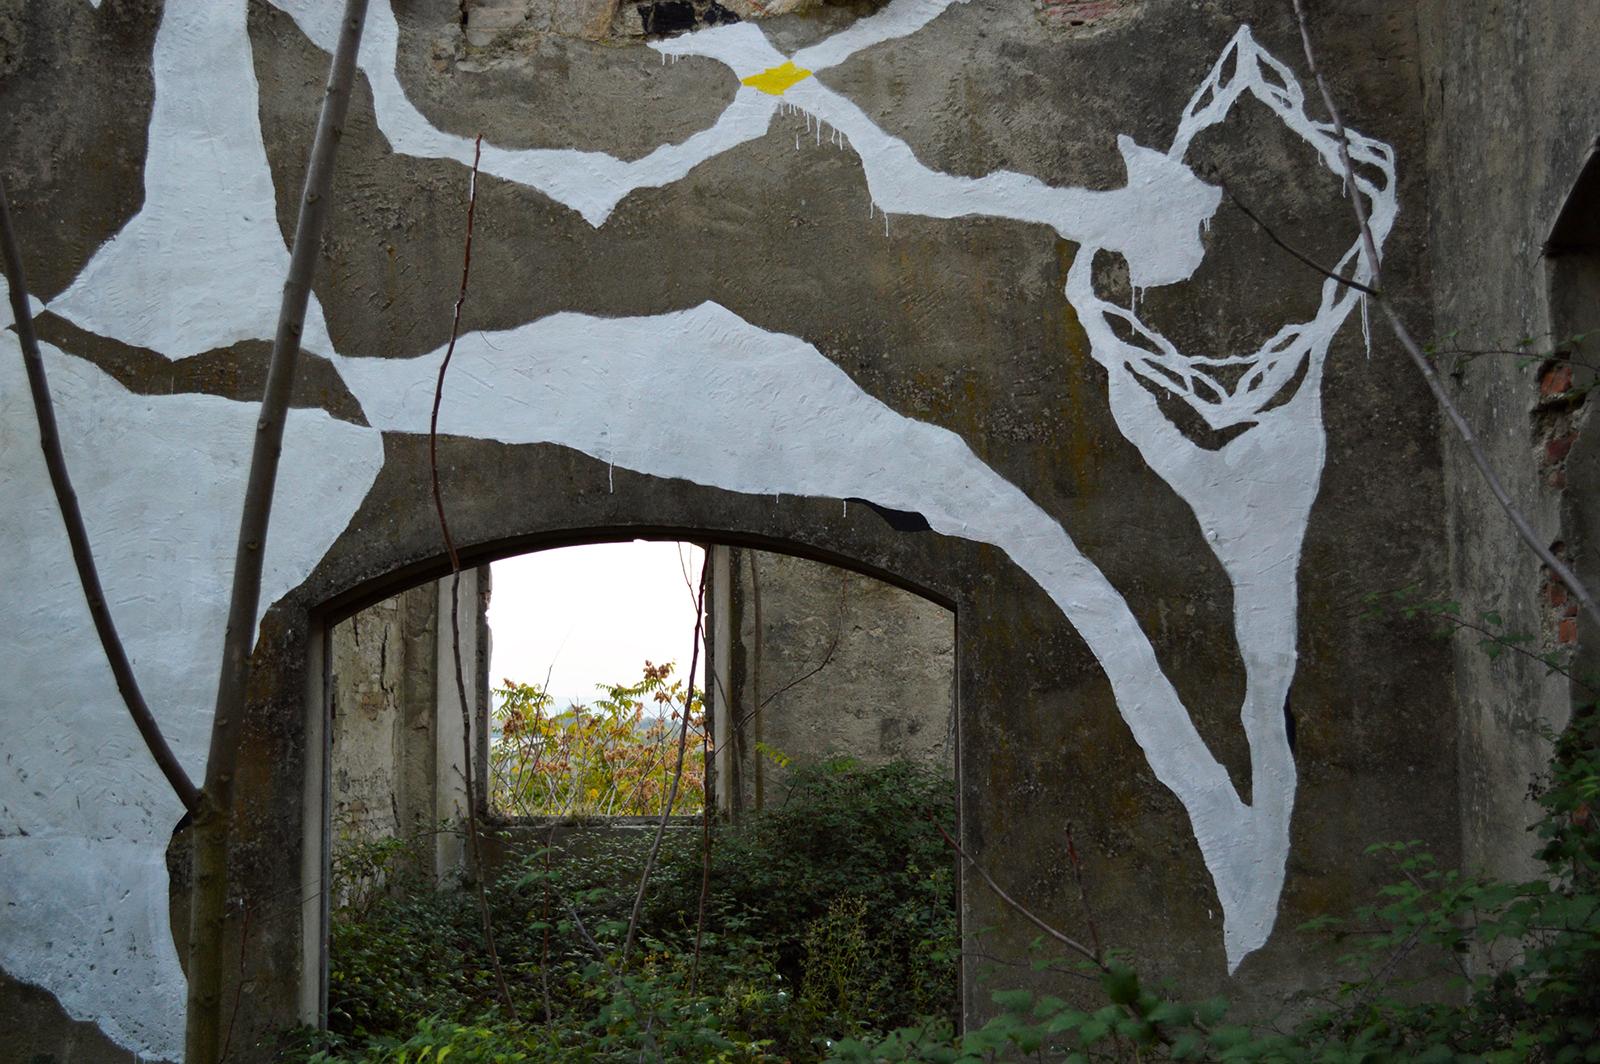 moallaseconda-new-mural-in-prato-08